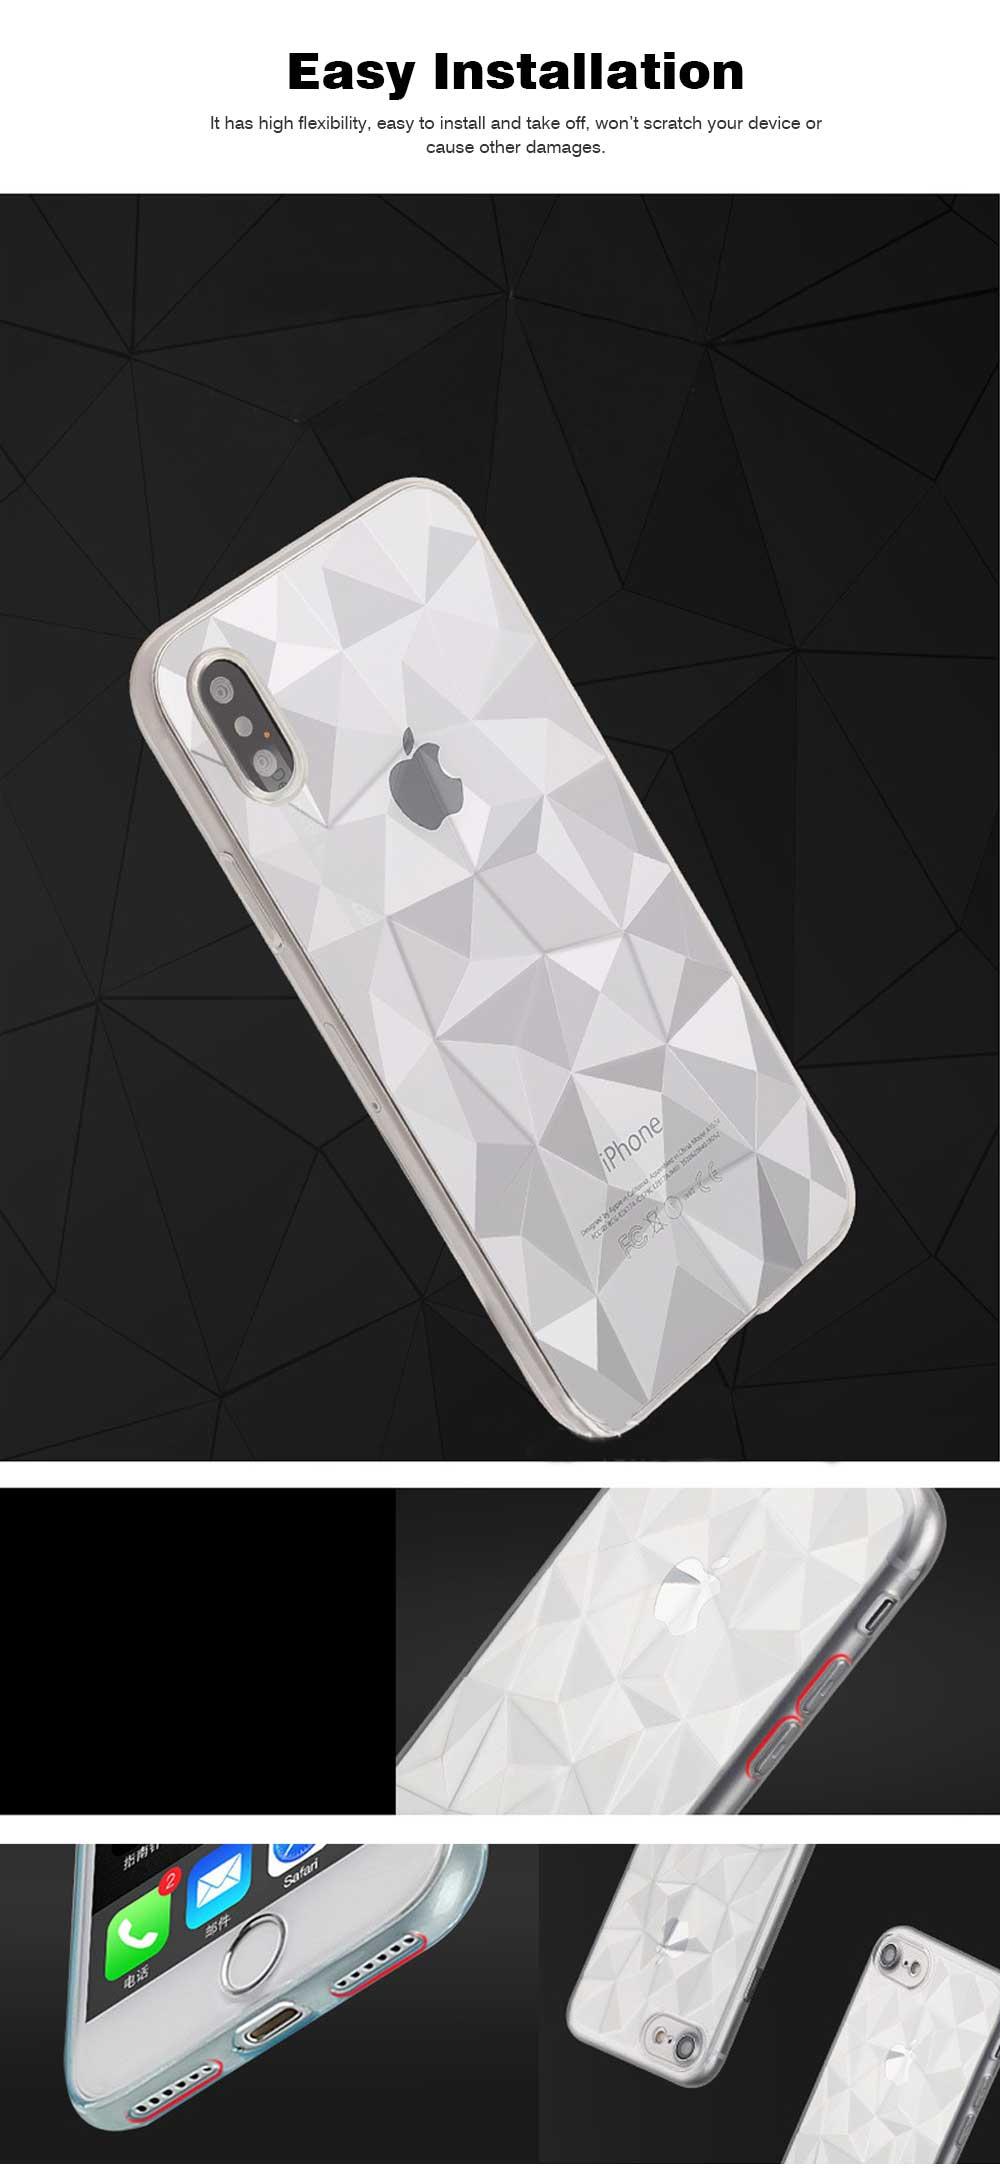 4.7-6.5 inch Soft Phone Case for iPhone Samsung Huawei, Rhombus TPU Phone Cover, Transparent Rhombus Pattern Phone Case 4